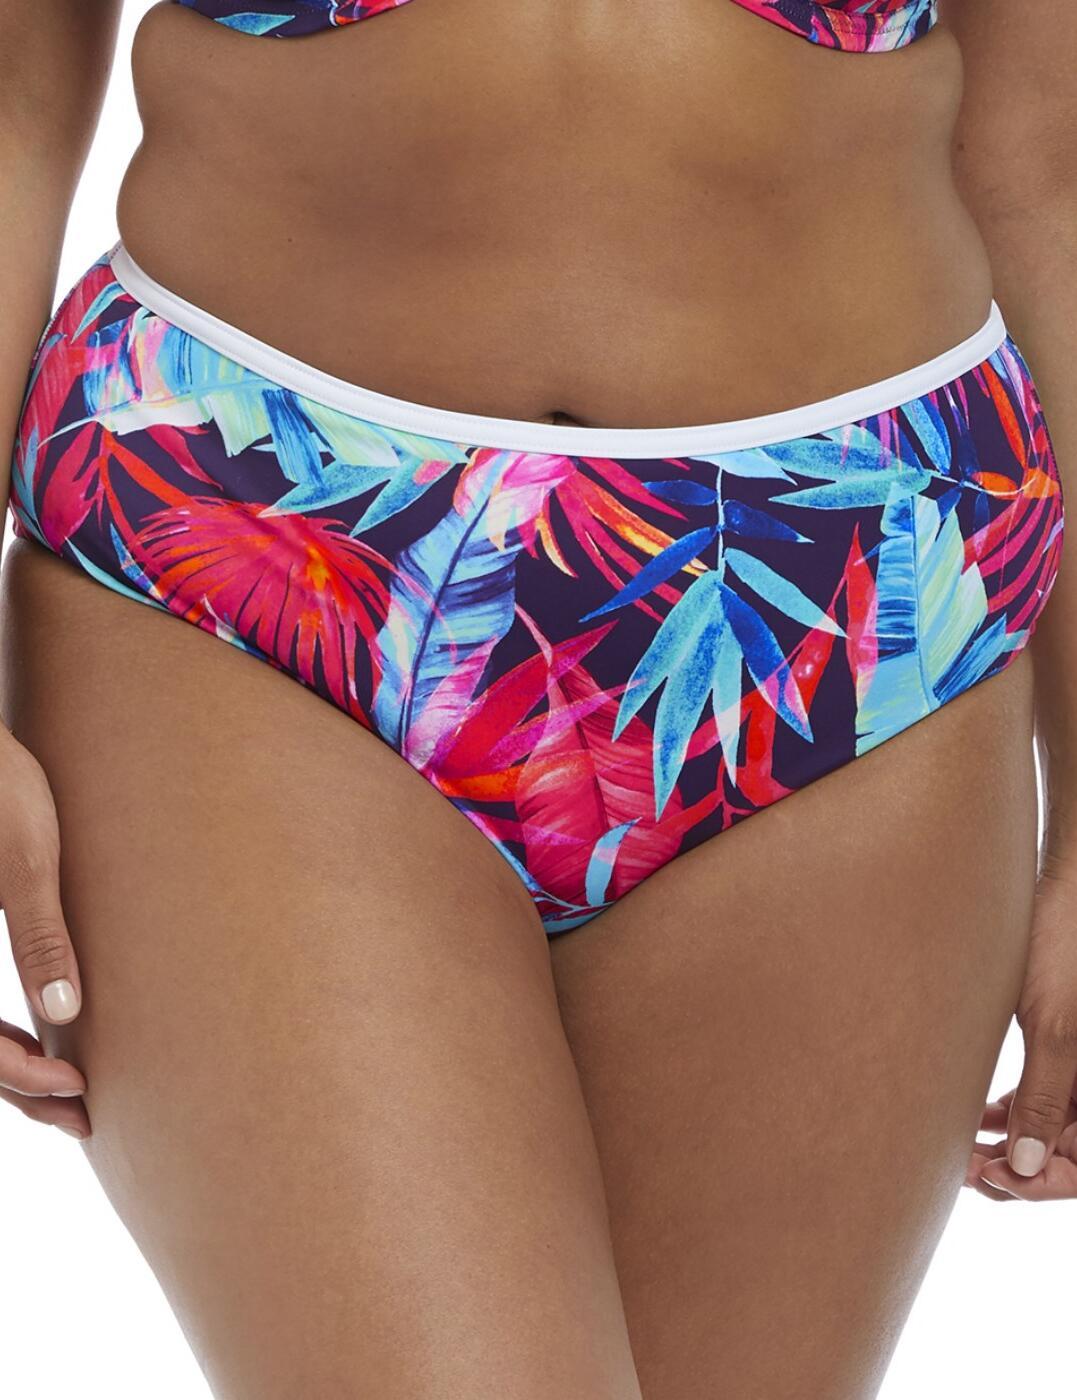 7144 Elomi Paradise Palm Bikini Brief - 7144 Ink